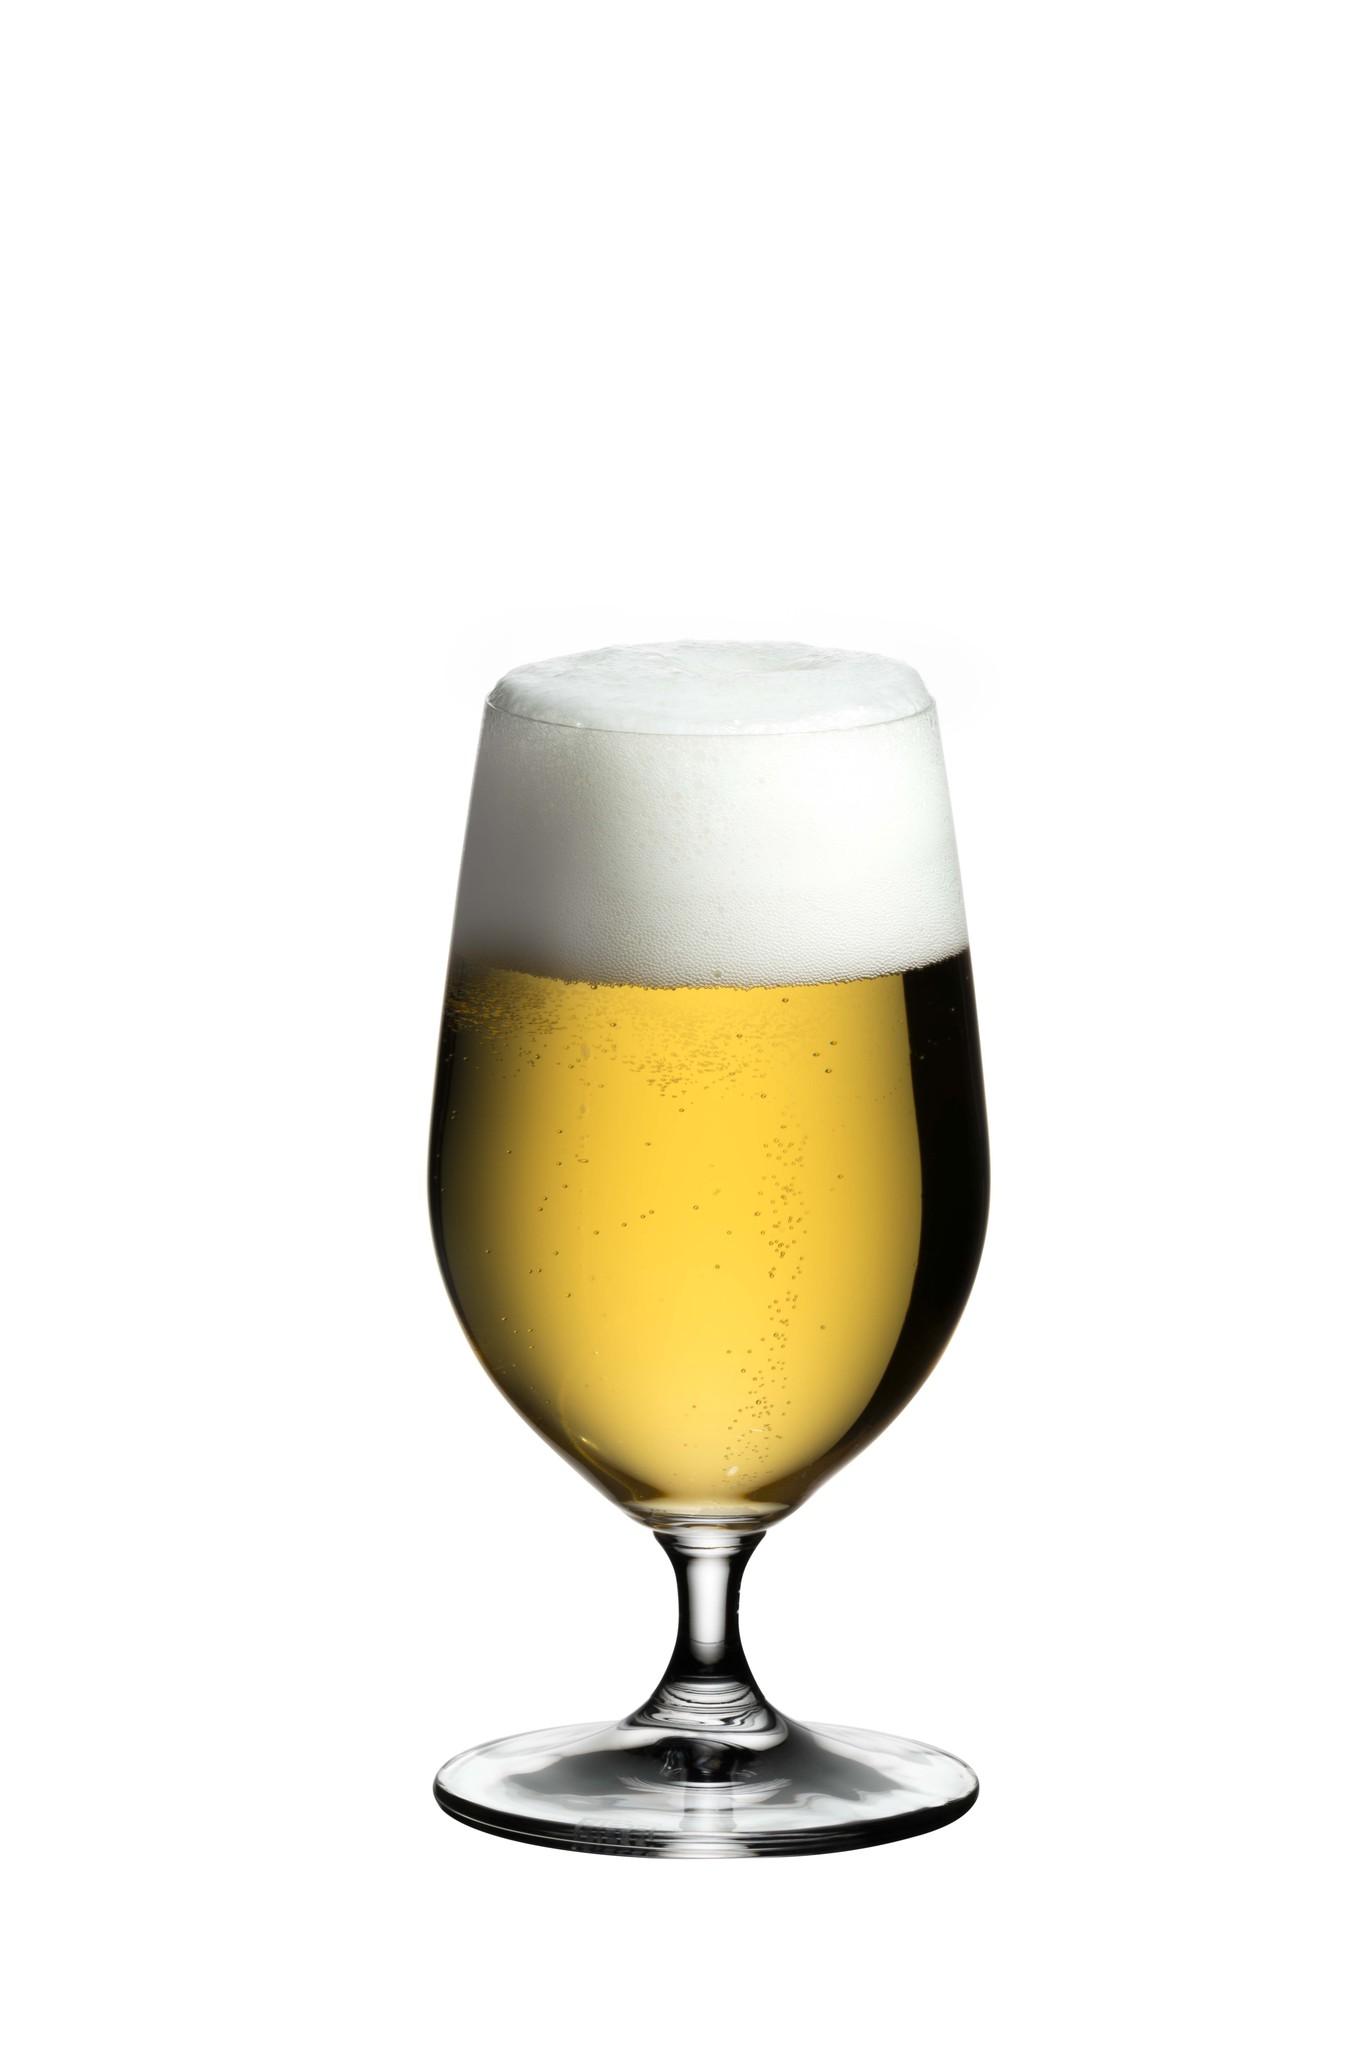 Бокалы Набор бокалов для пива 2шт 500мл Riedel Ouverture Beer nabor-bokalov-dlya-piva-2sht-160ml-riedel-ouverture-beer-avstriya.jpg